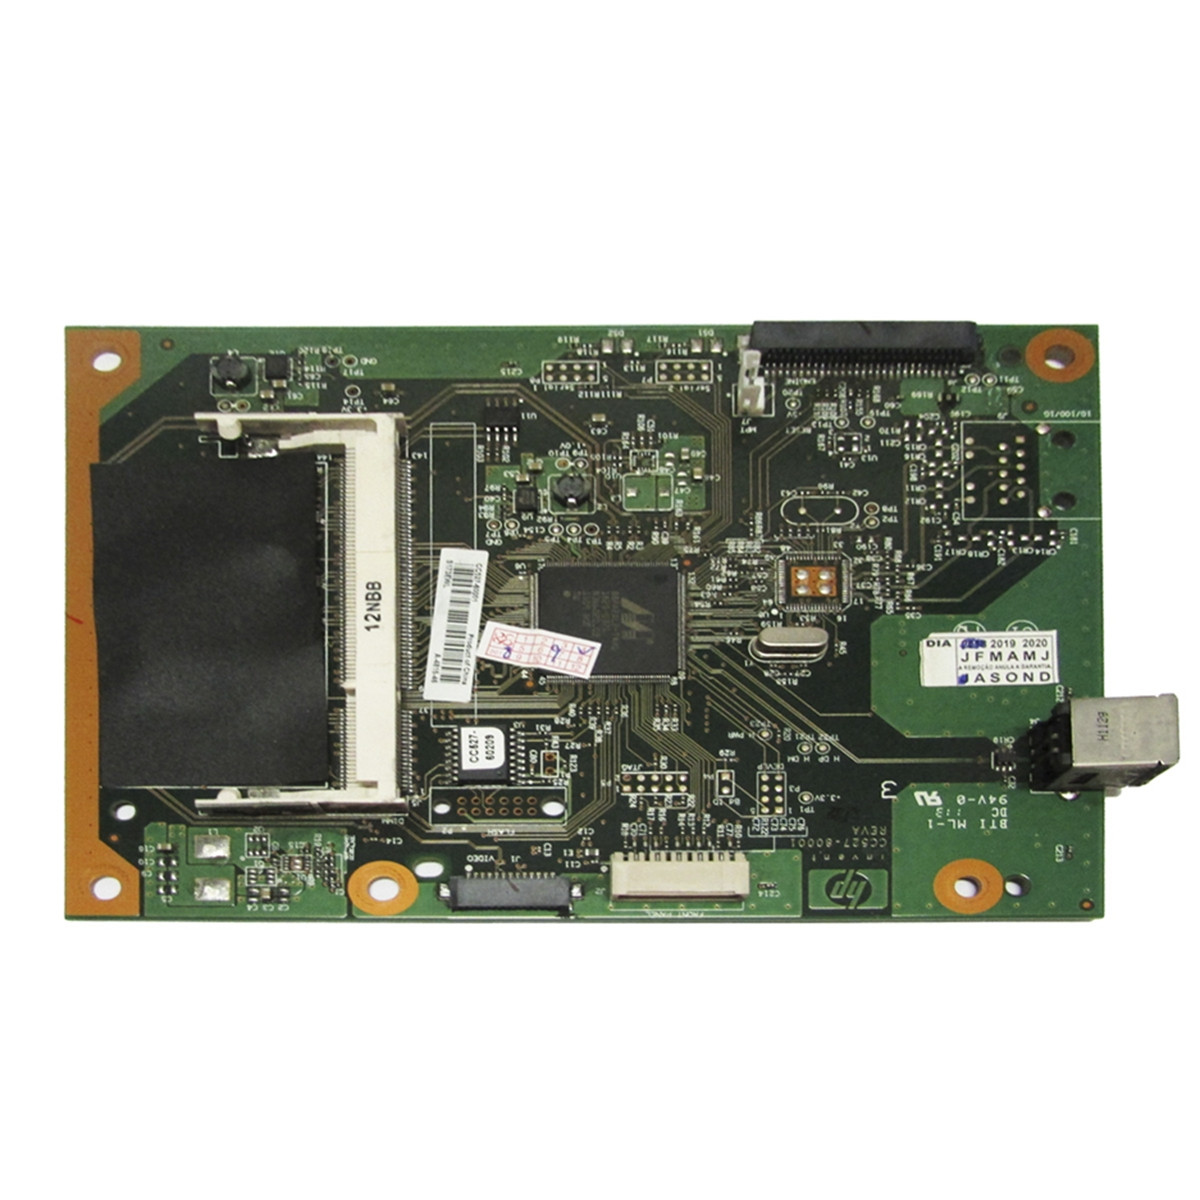 Placa Lógica ou Controladora HP LaserJet P2055 P2055D P2055DN P2055X | Compatível